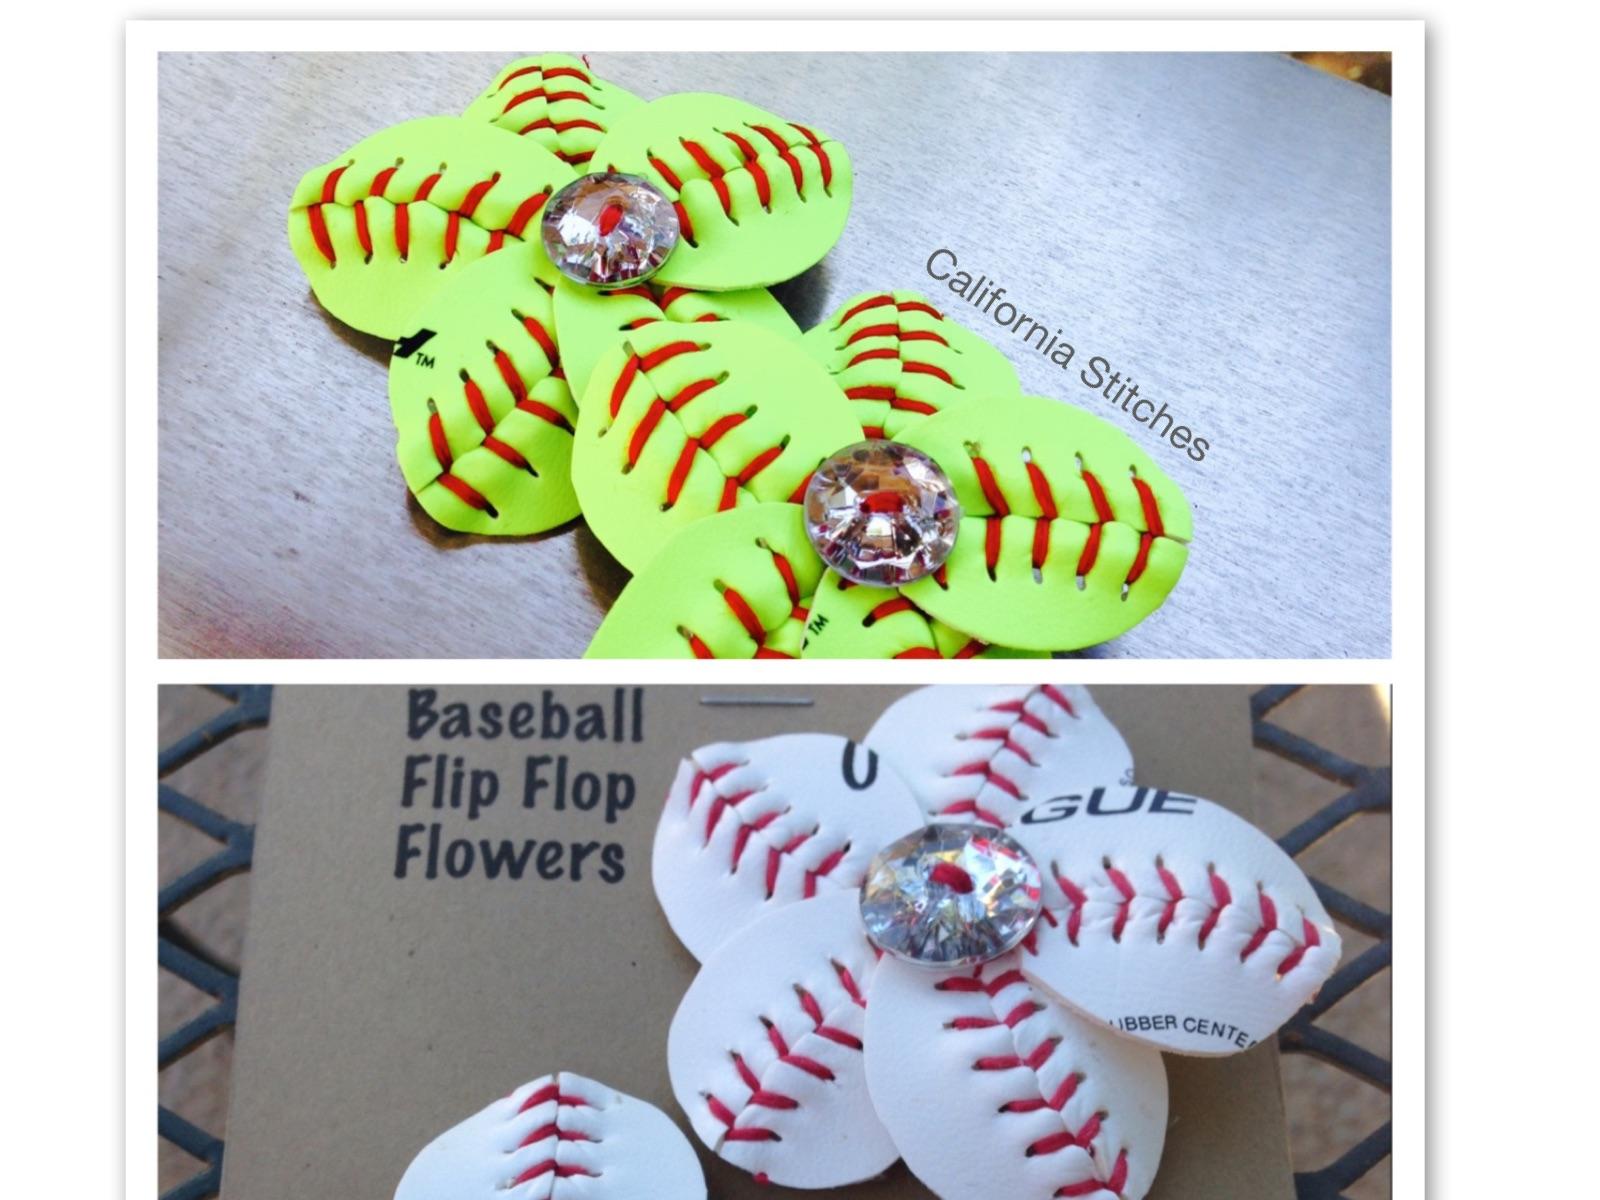 43bde14fb Bling Button Baseball or Softball Flip Flop Flowers